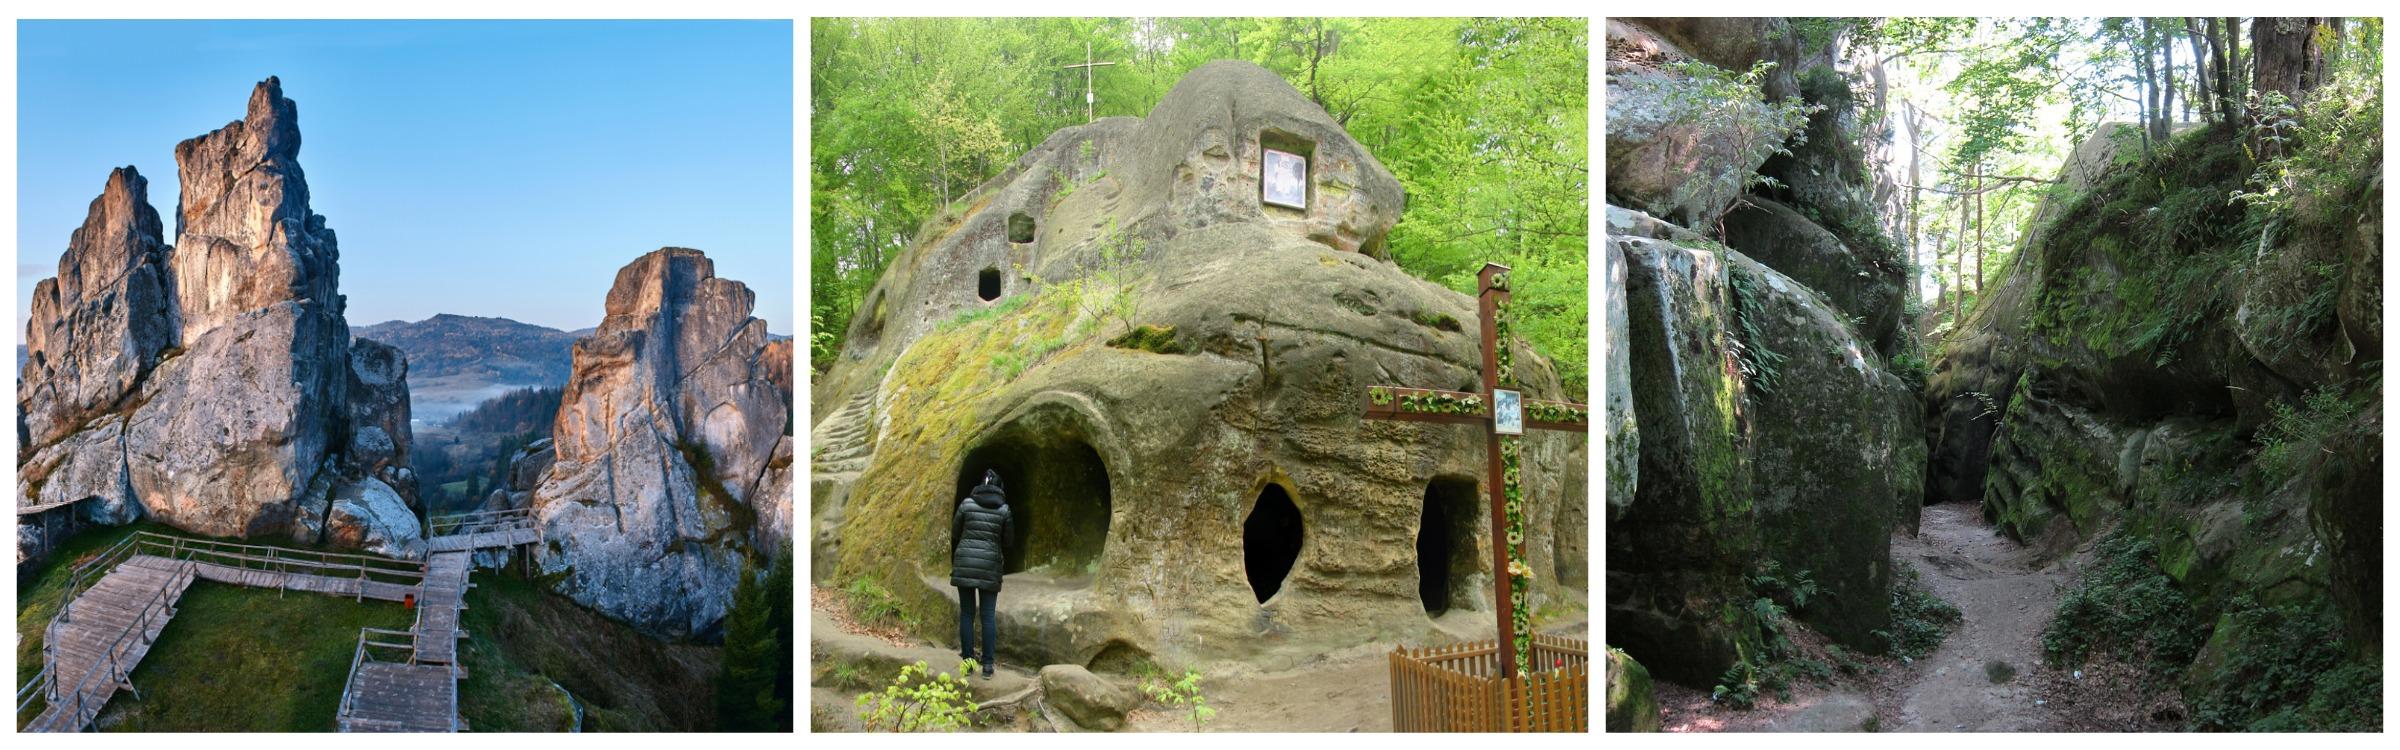 форт «Тустань», печера монастир, скелі Довбуша